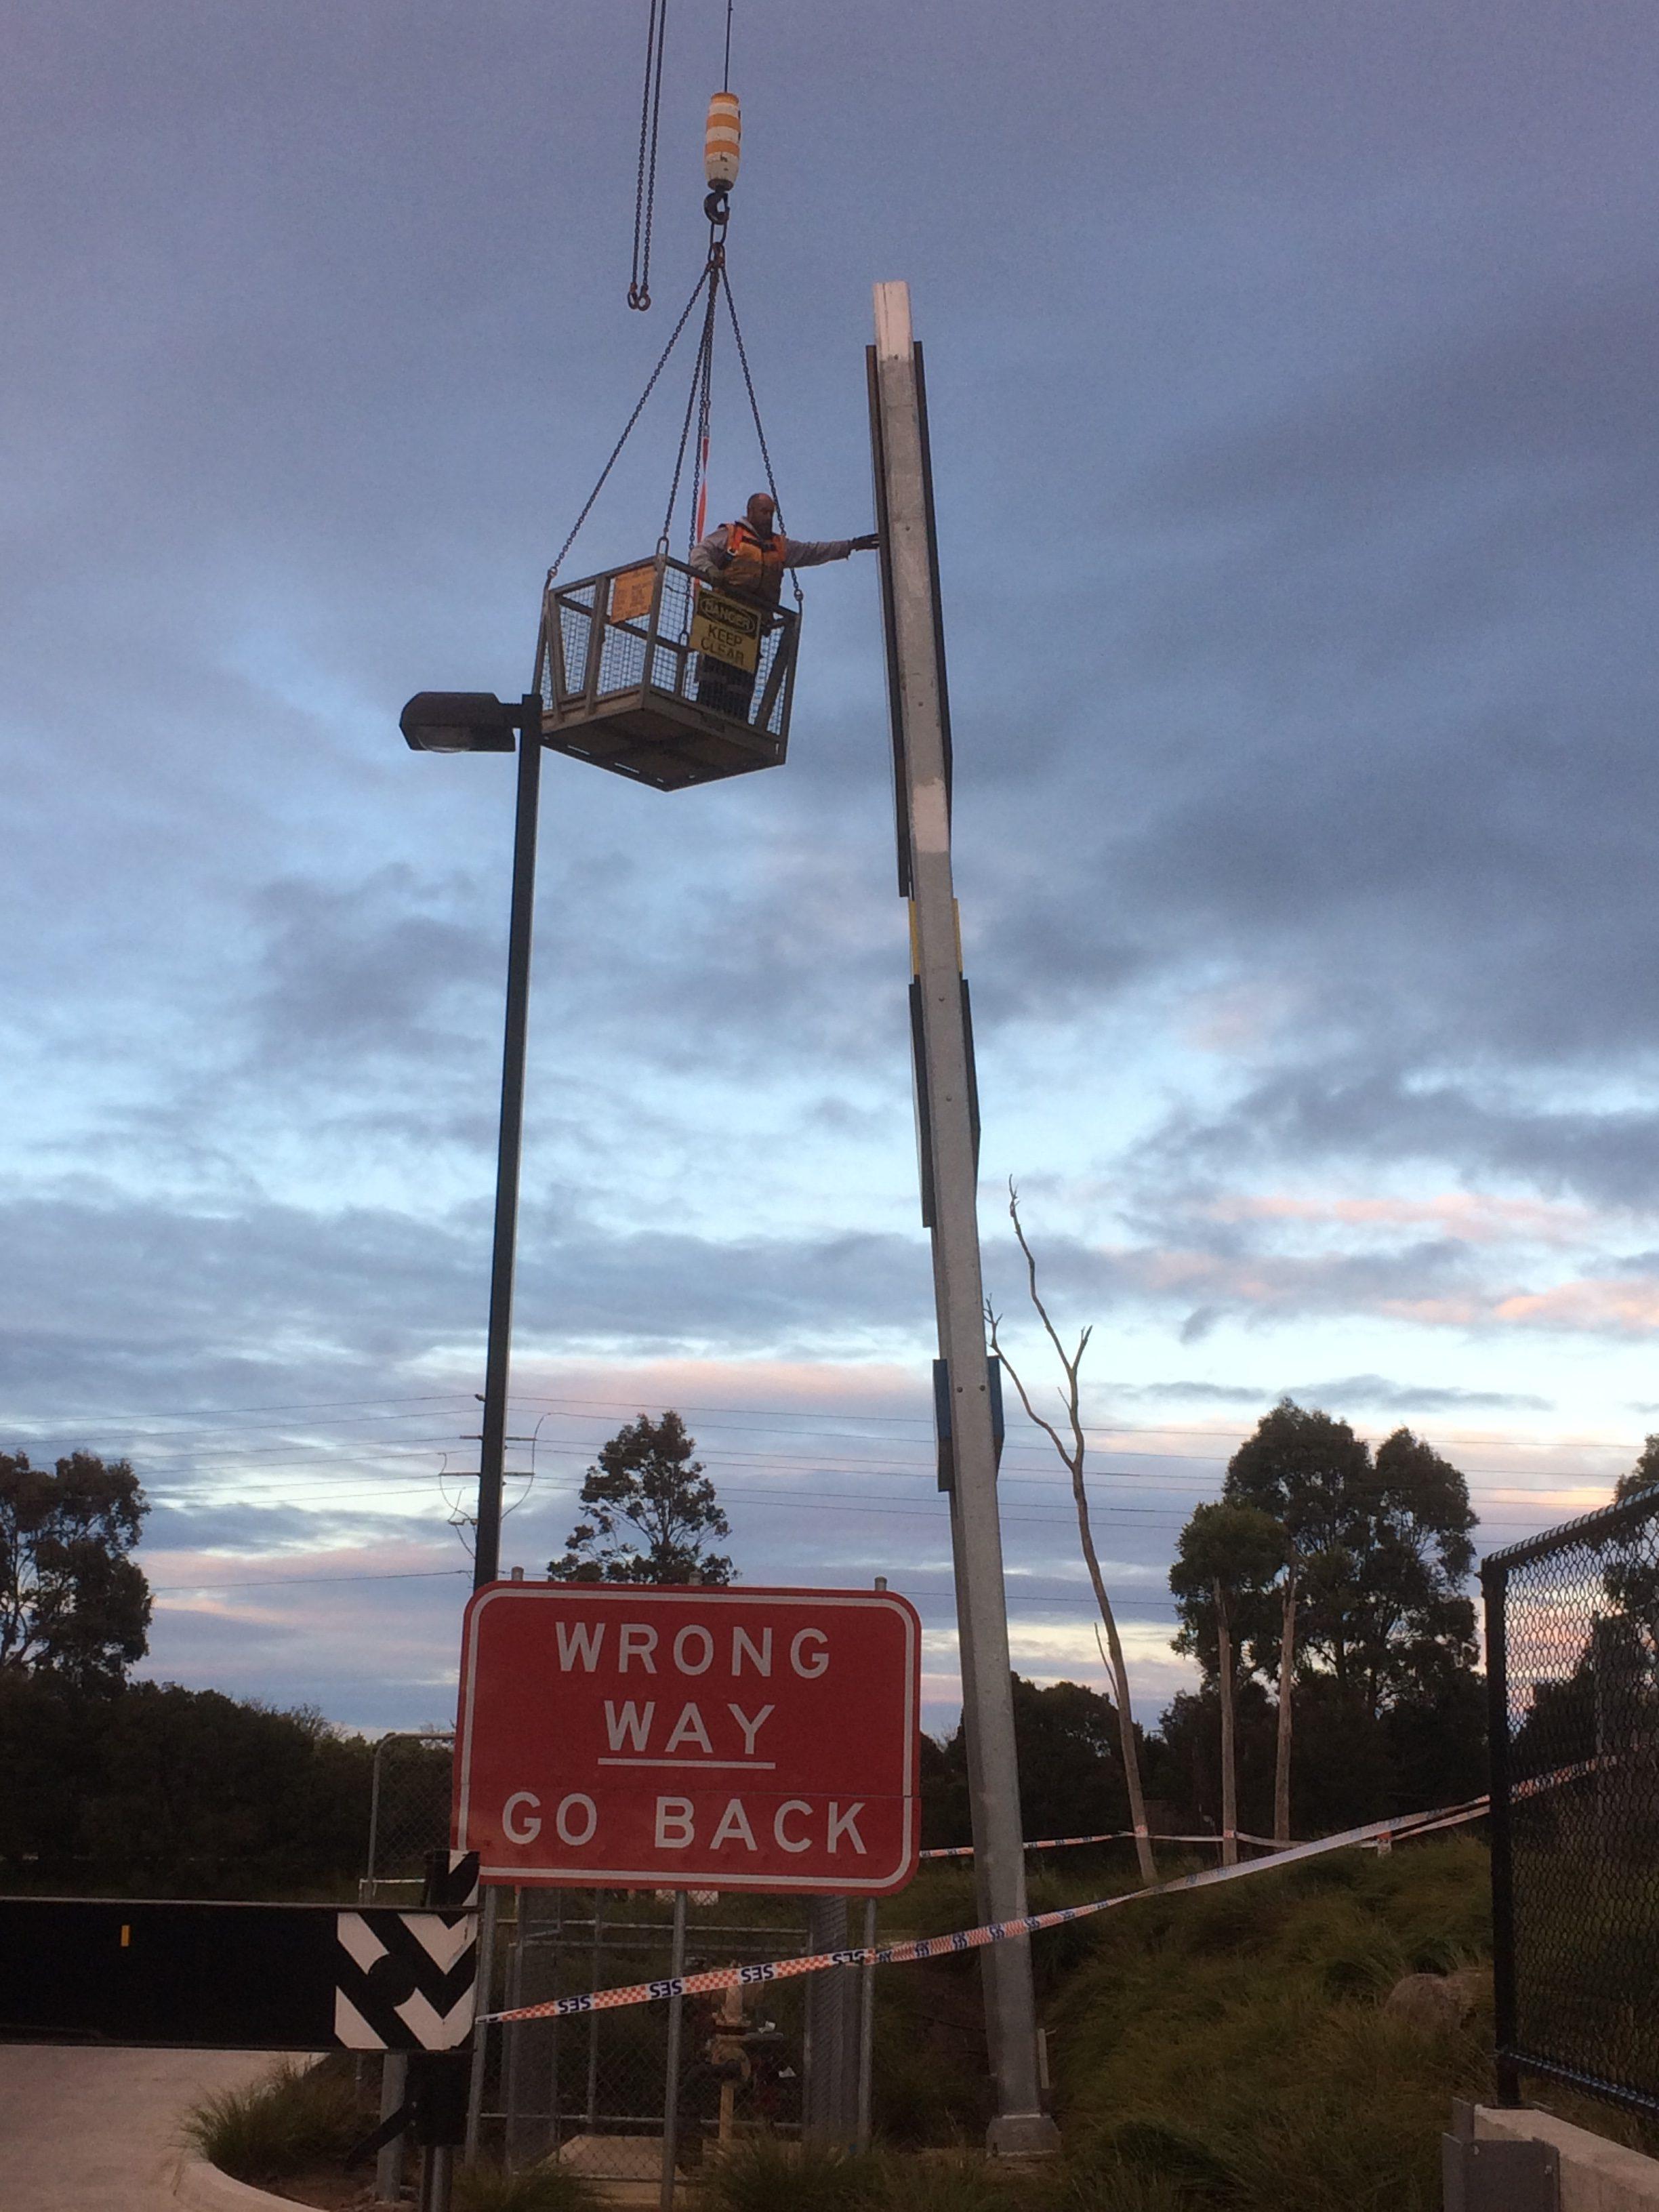 electrical contractors Berwick using crane